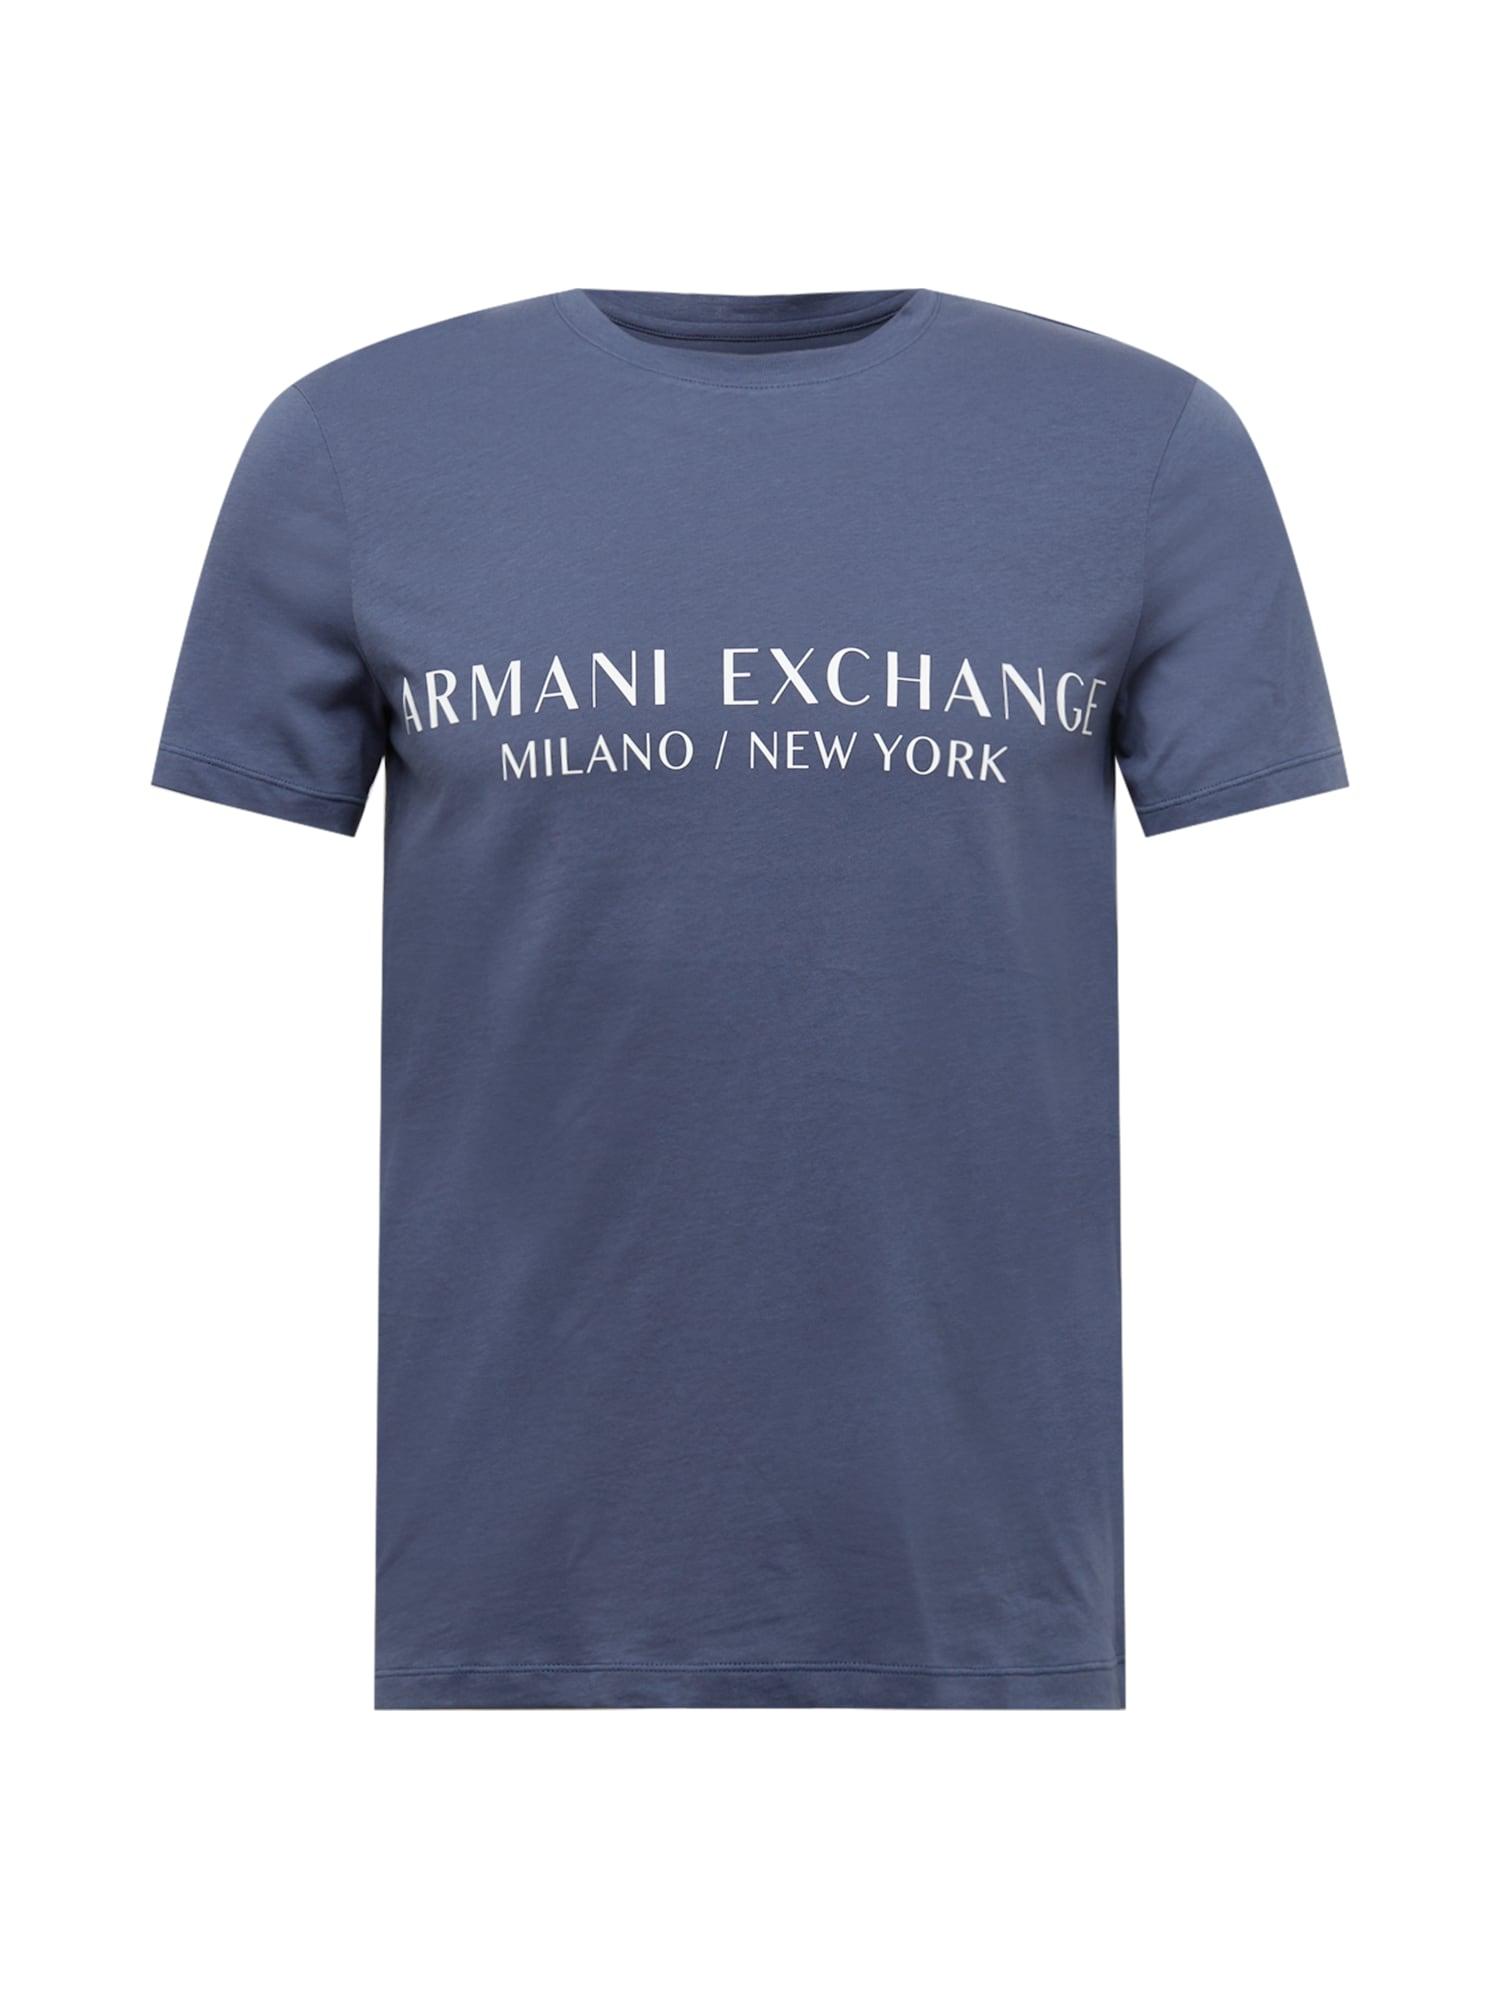 ARMANI EXCHANGE Tričko  marine modrá / bílá